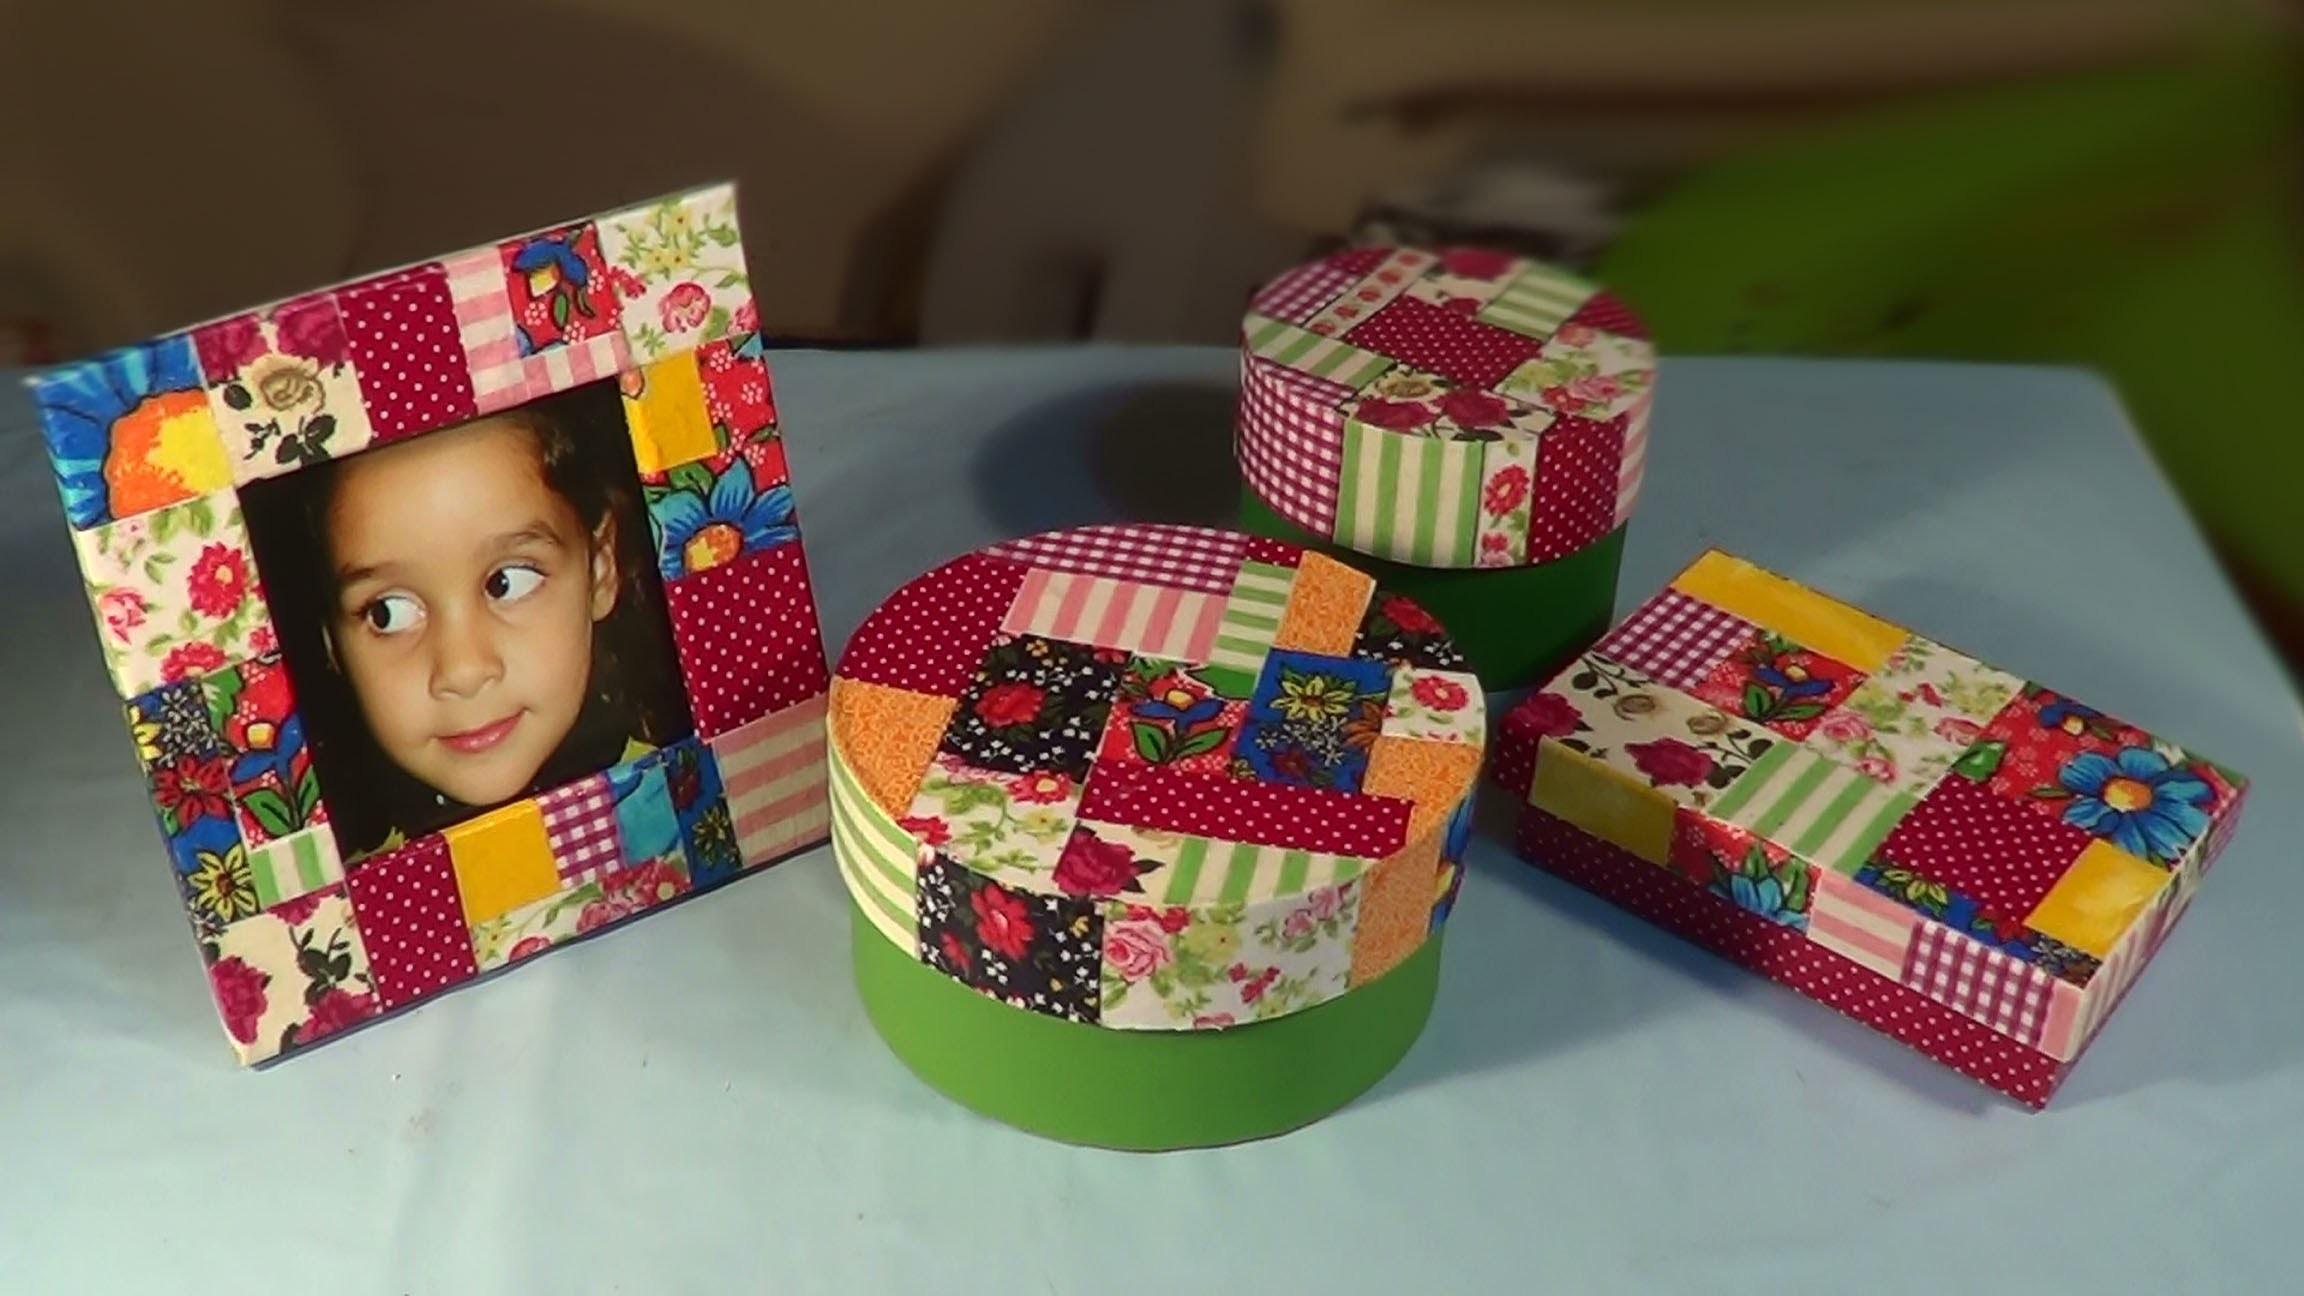 Caixa redonda PARTE 2 - Patchwork. Round Box Part 2 - Caja redonda Parte 2